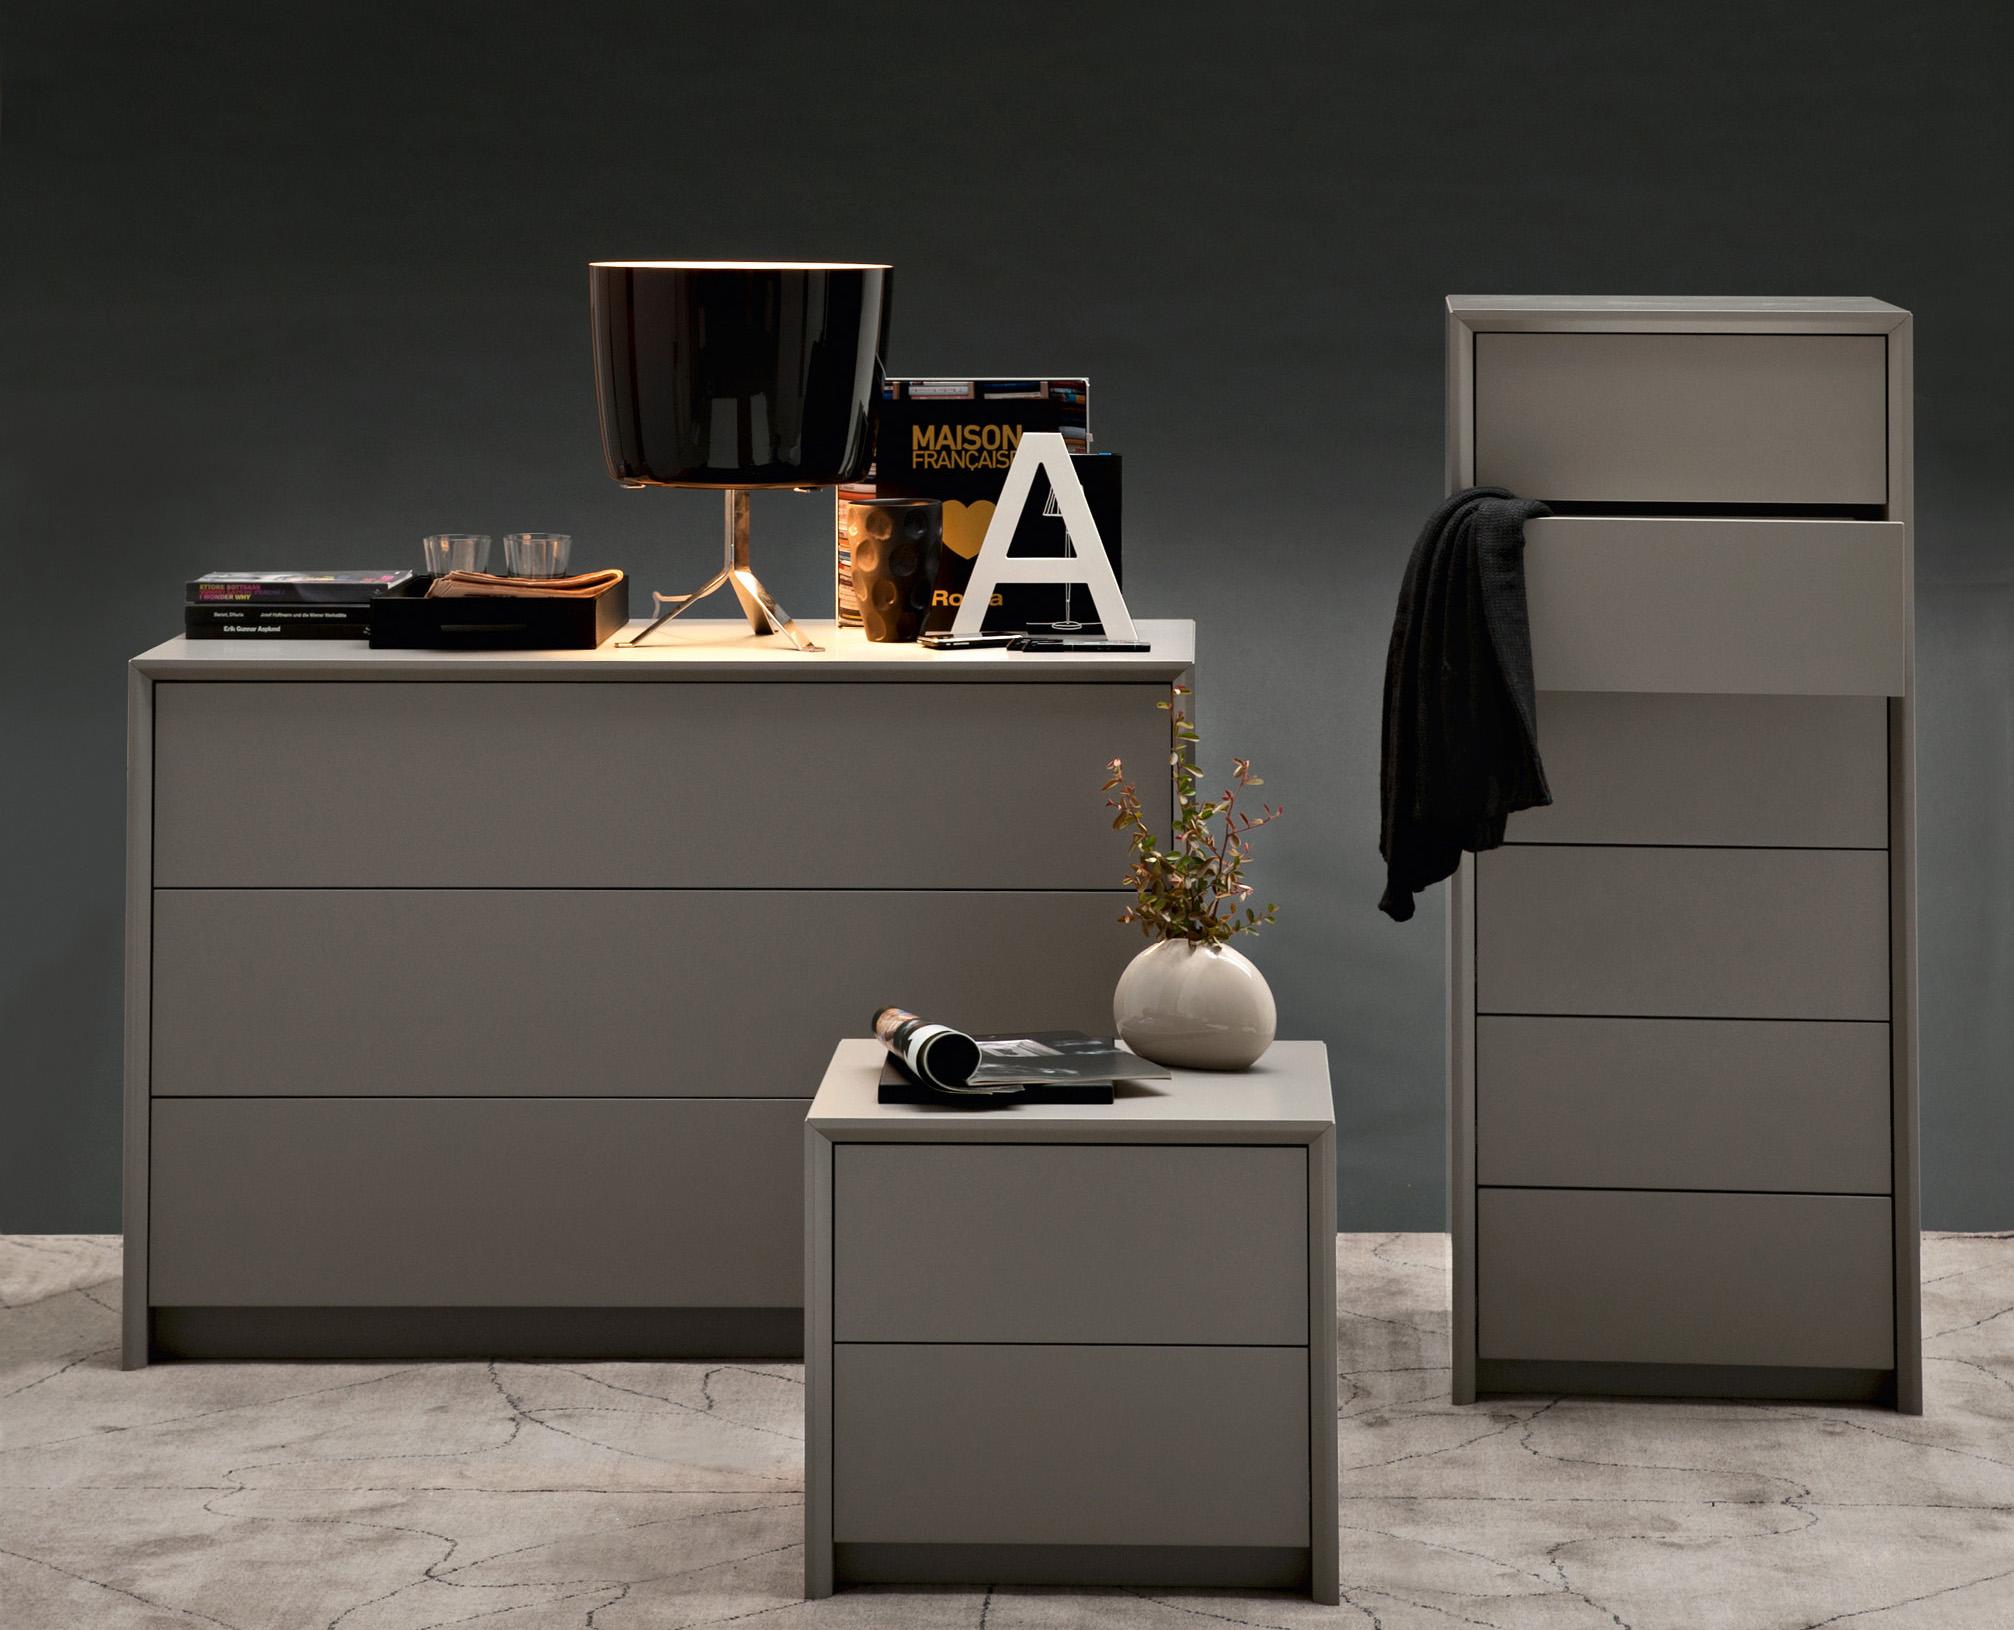 Calligaris password 21 compact 3 drawer bedroom dresser for Calligaris comodini